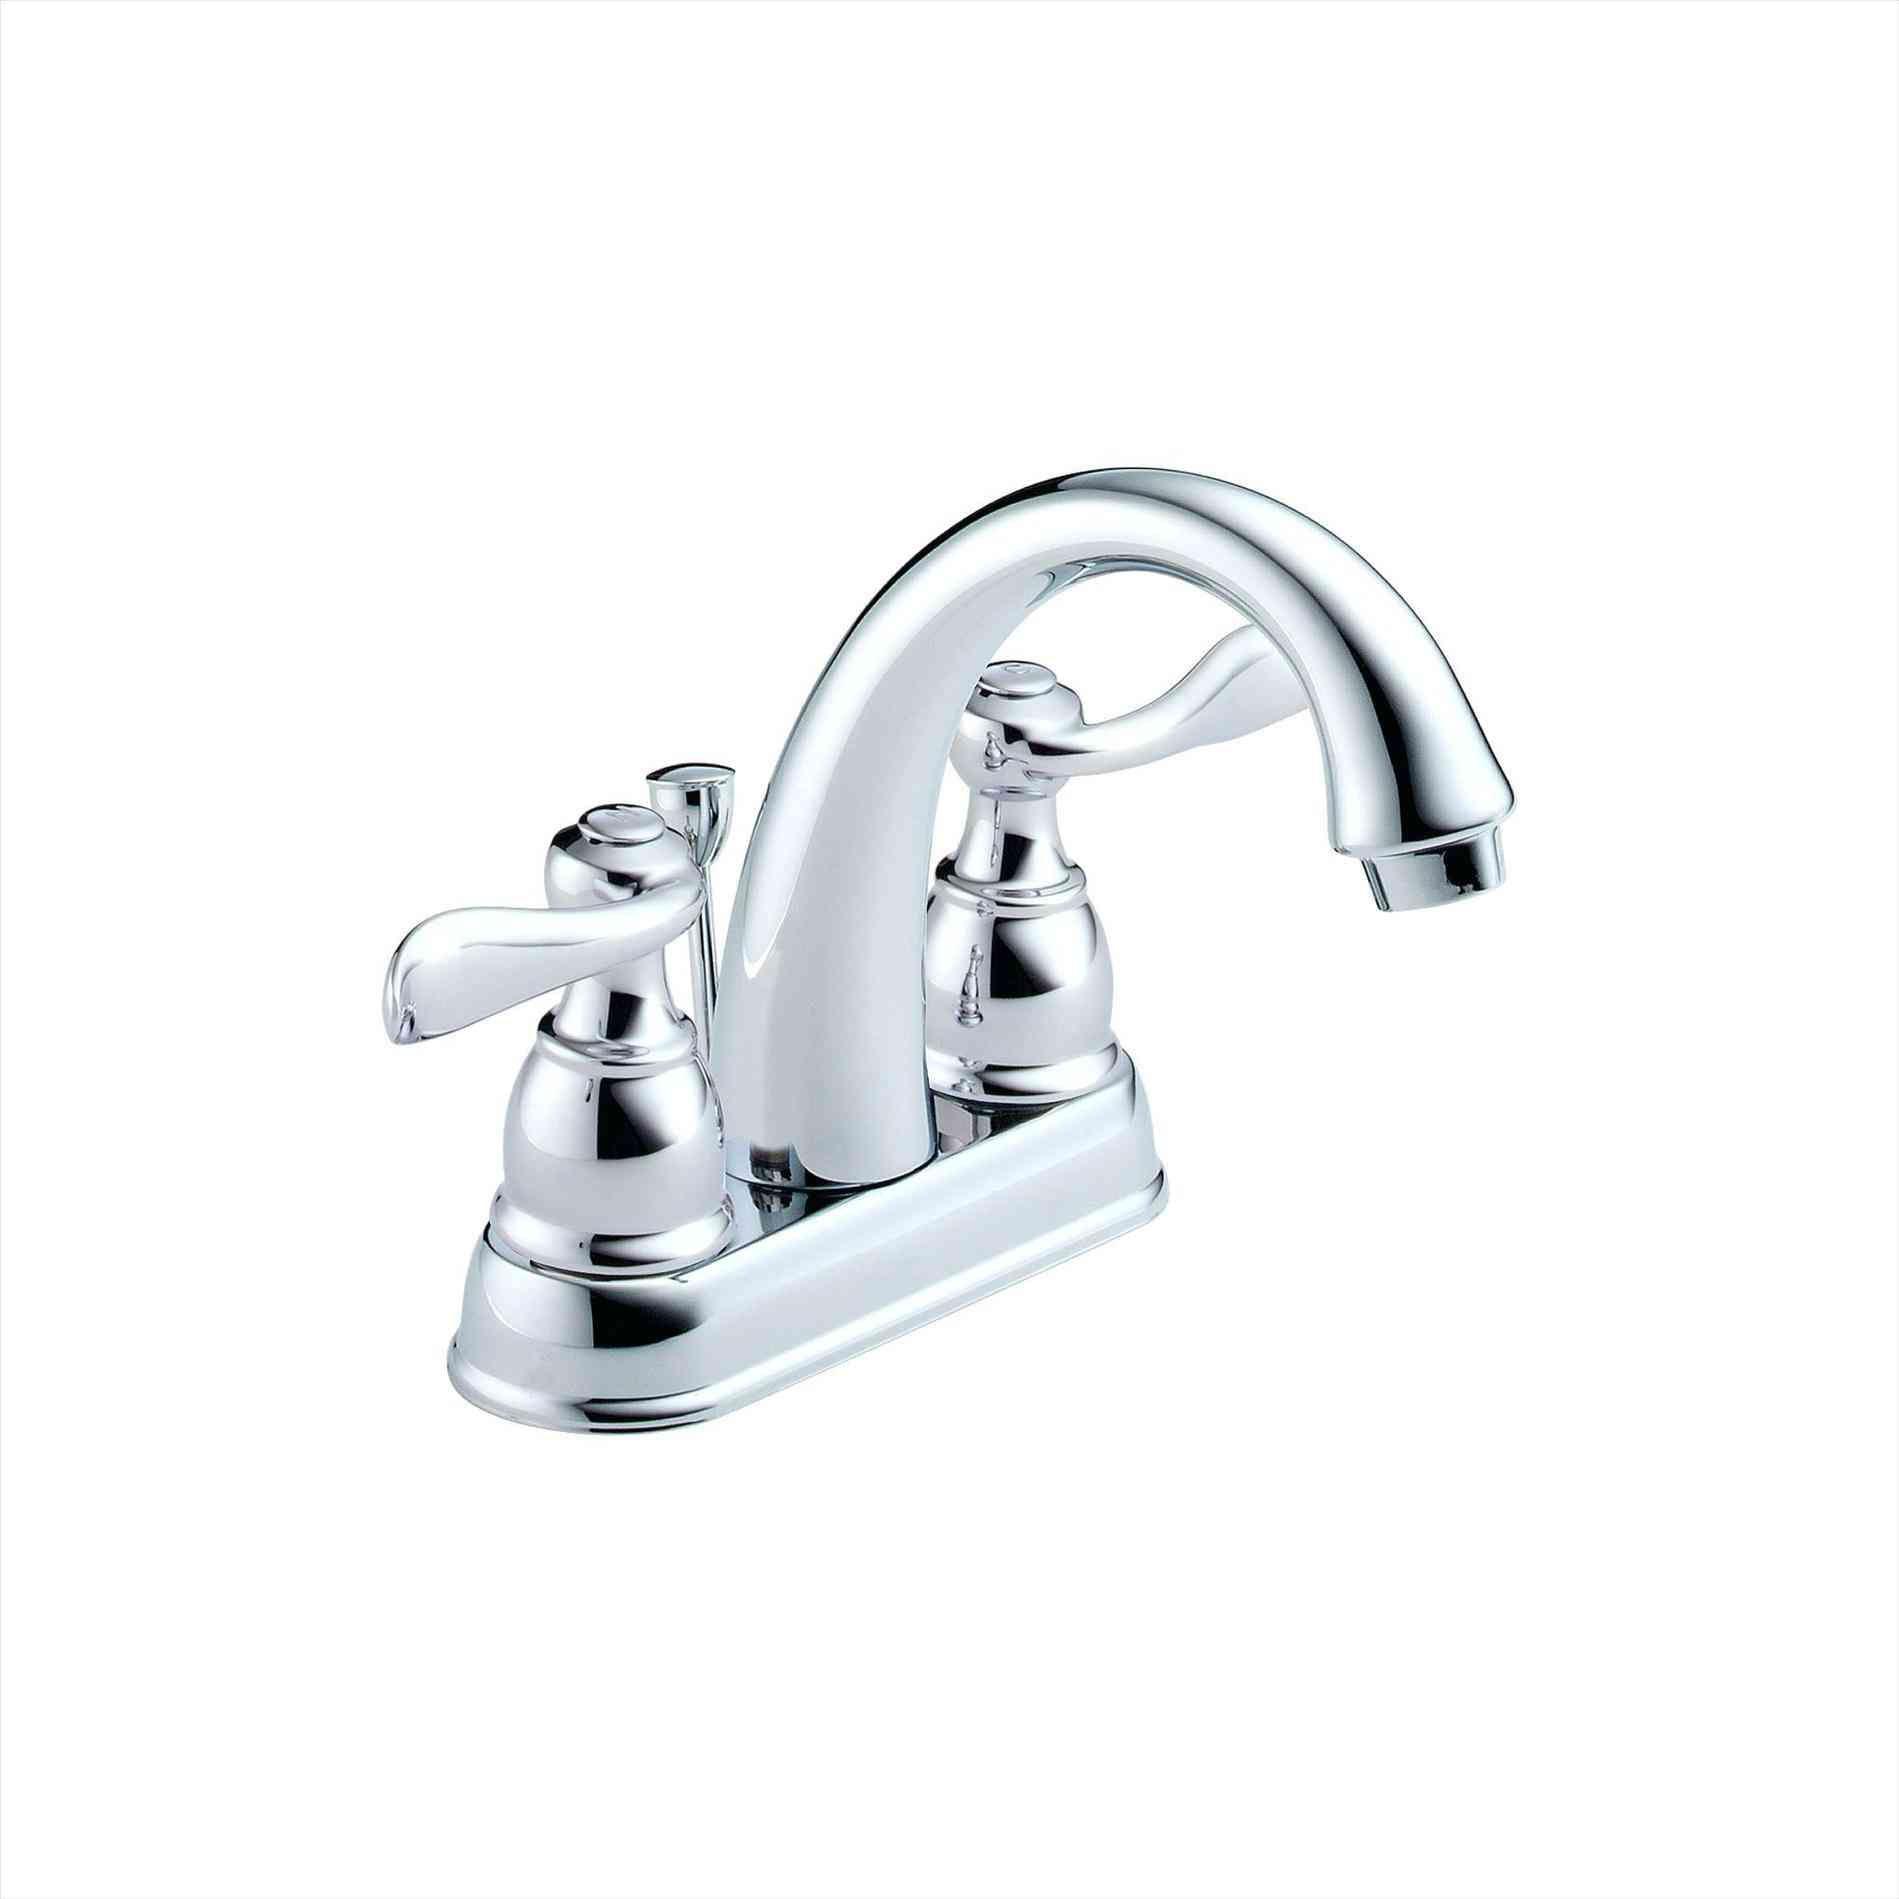 New Post delta bathroom faucet repair two handle | Bathroom_Ideas ...